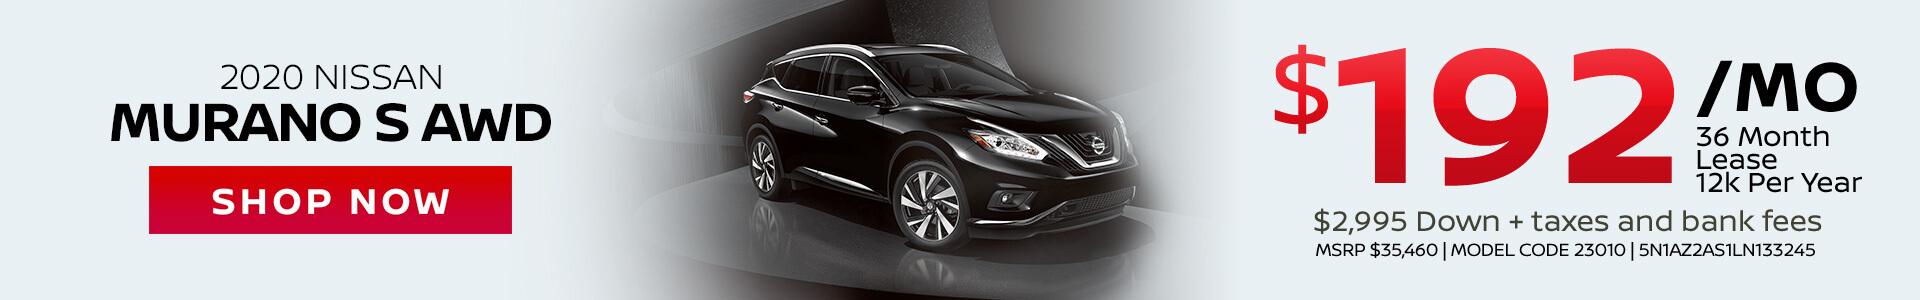 Nissan Murano $192 Lease